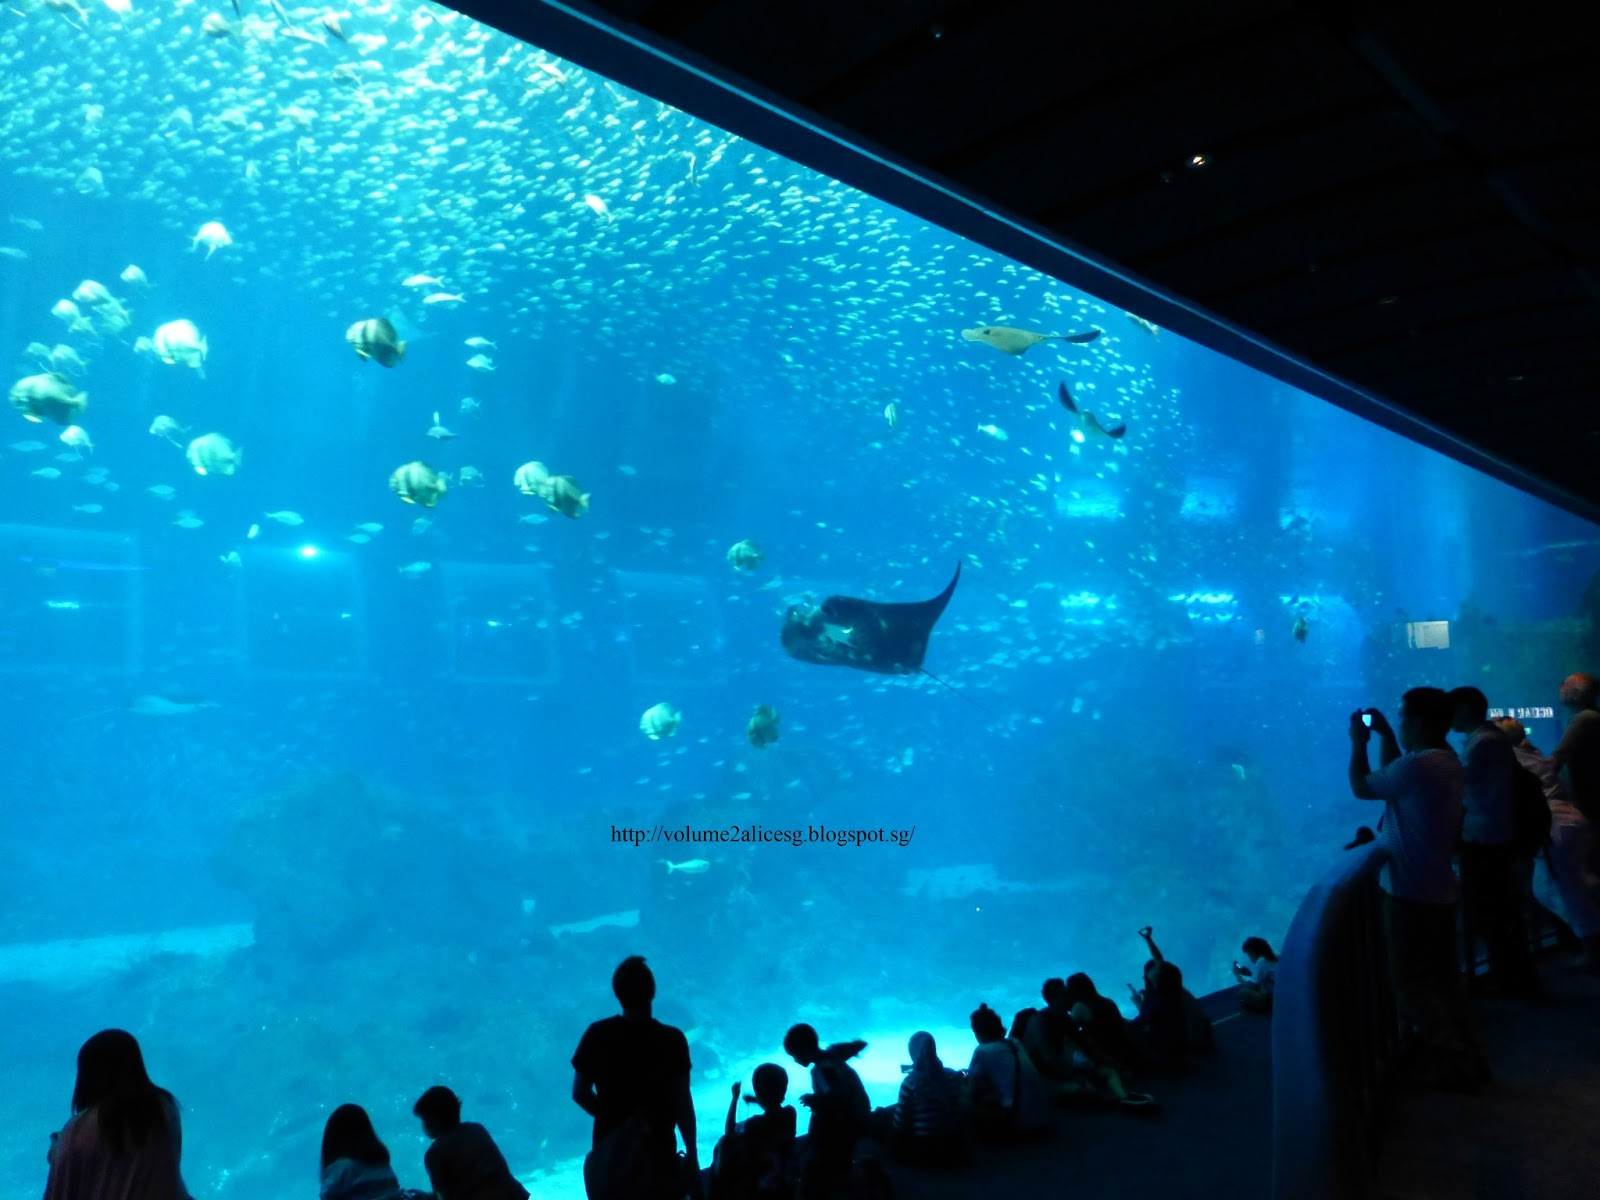 Alicesg Singaporemyhome My World Tuesday Sea Aquarium